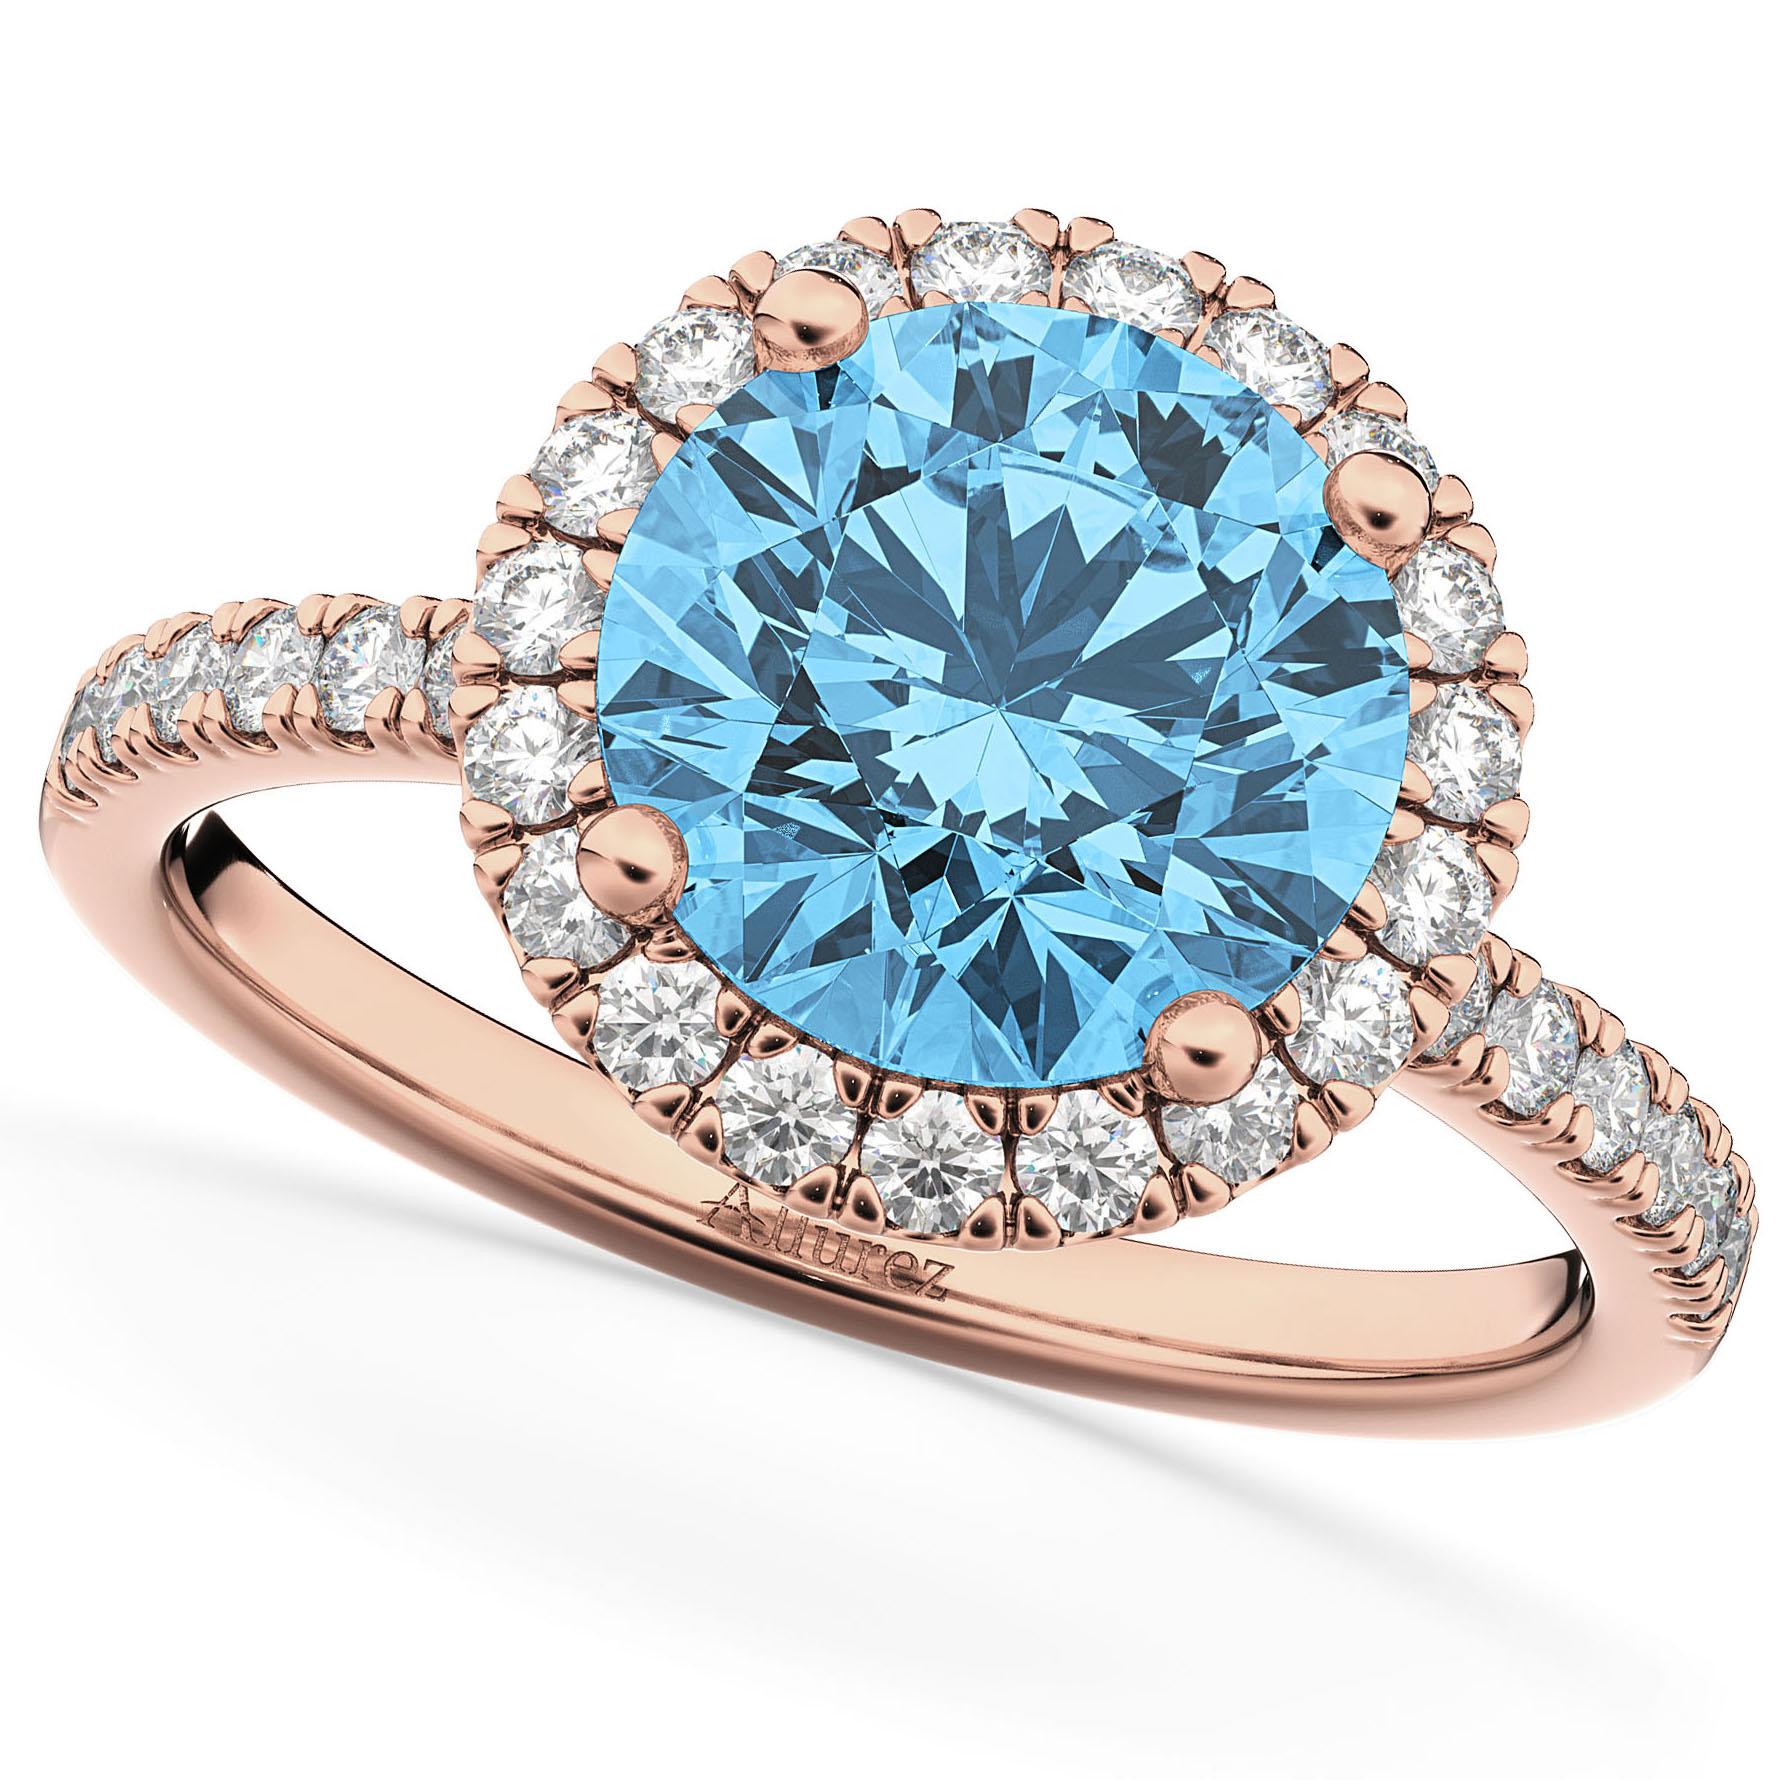 Halo Blue Topaz & Diamond Engagement Ring 14K Rose Gold 3.00ct